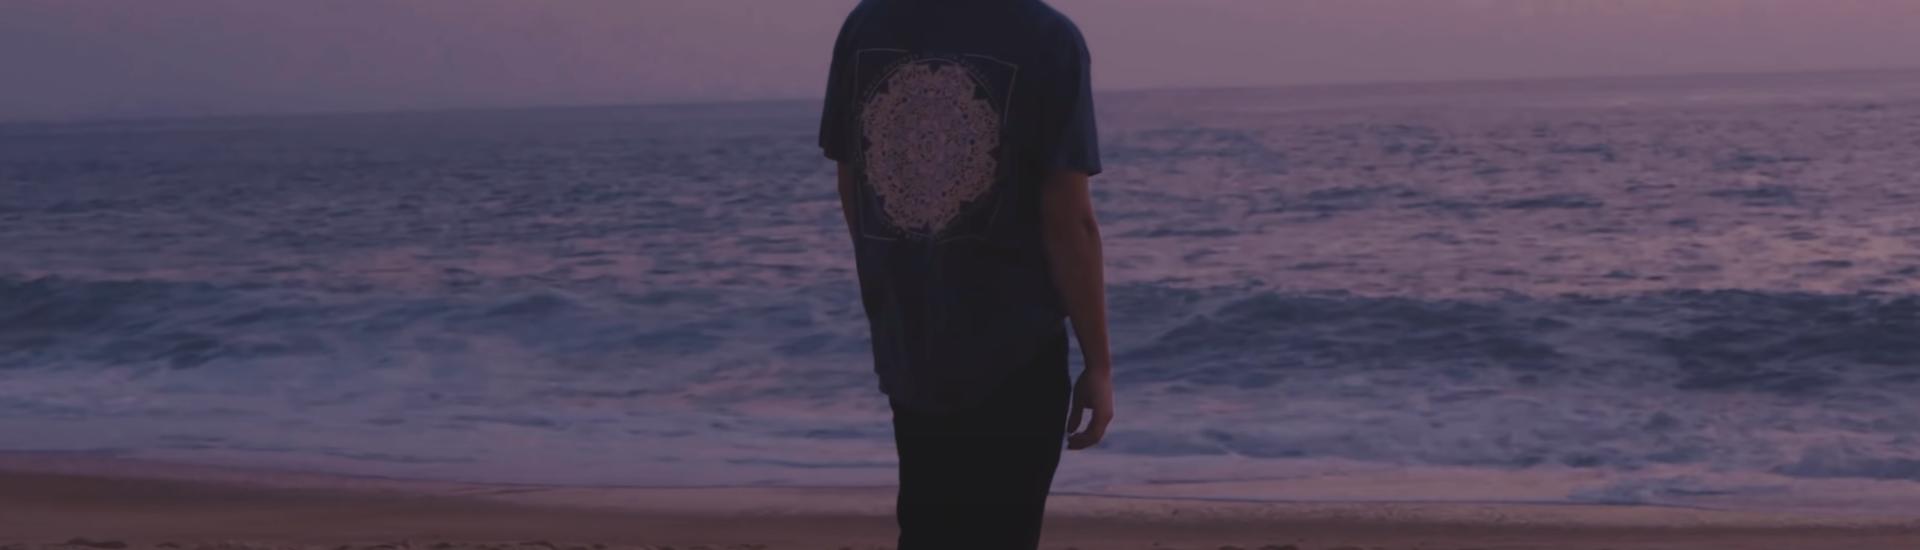 "Rawb dévoile son 1er album ""The Beachfront"""